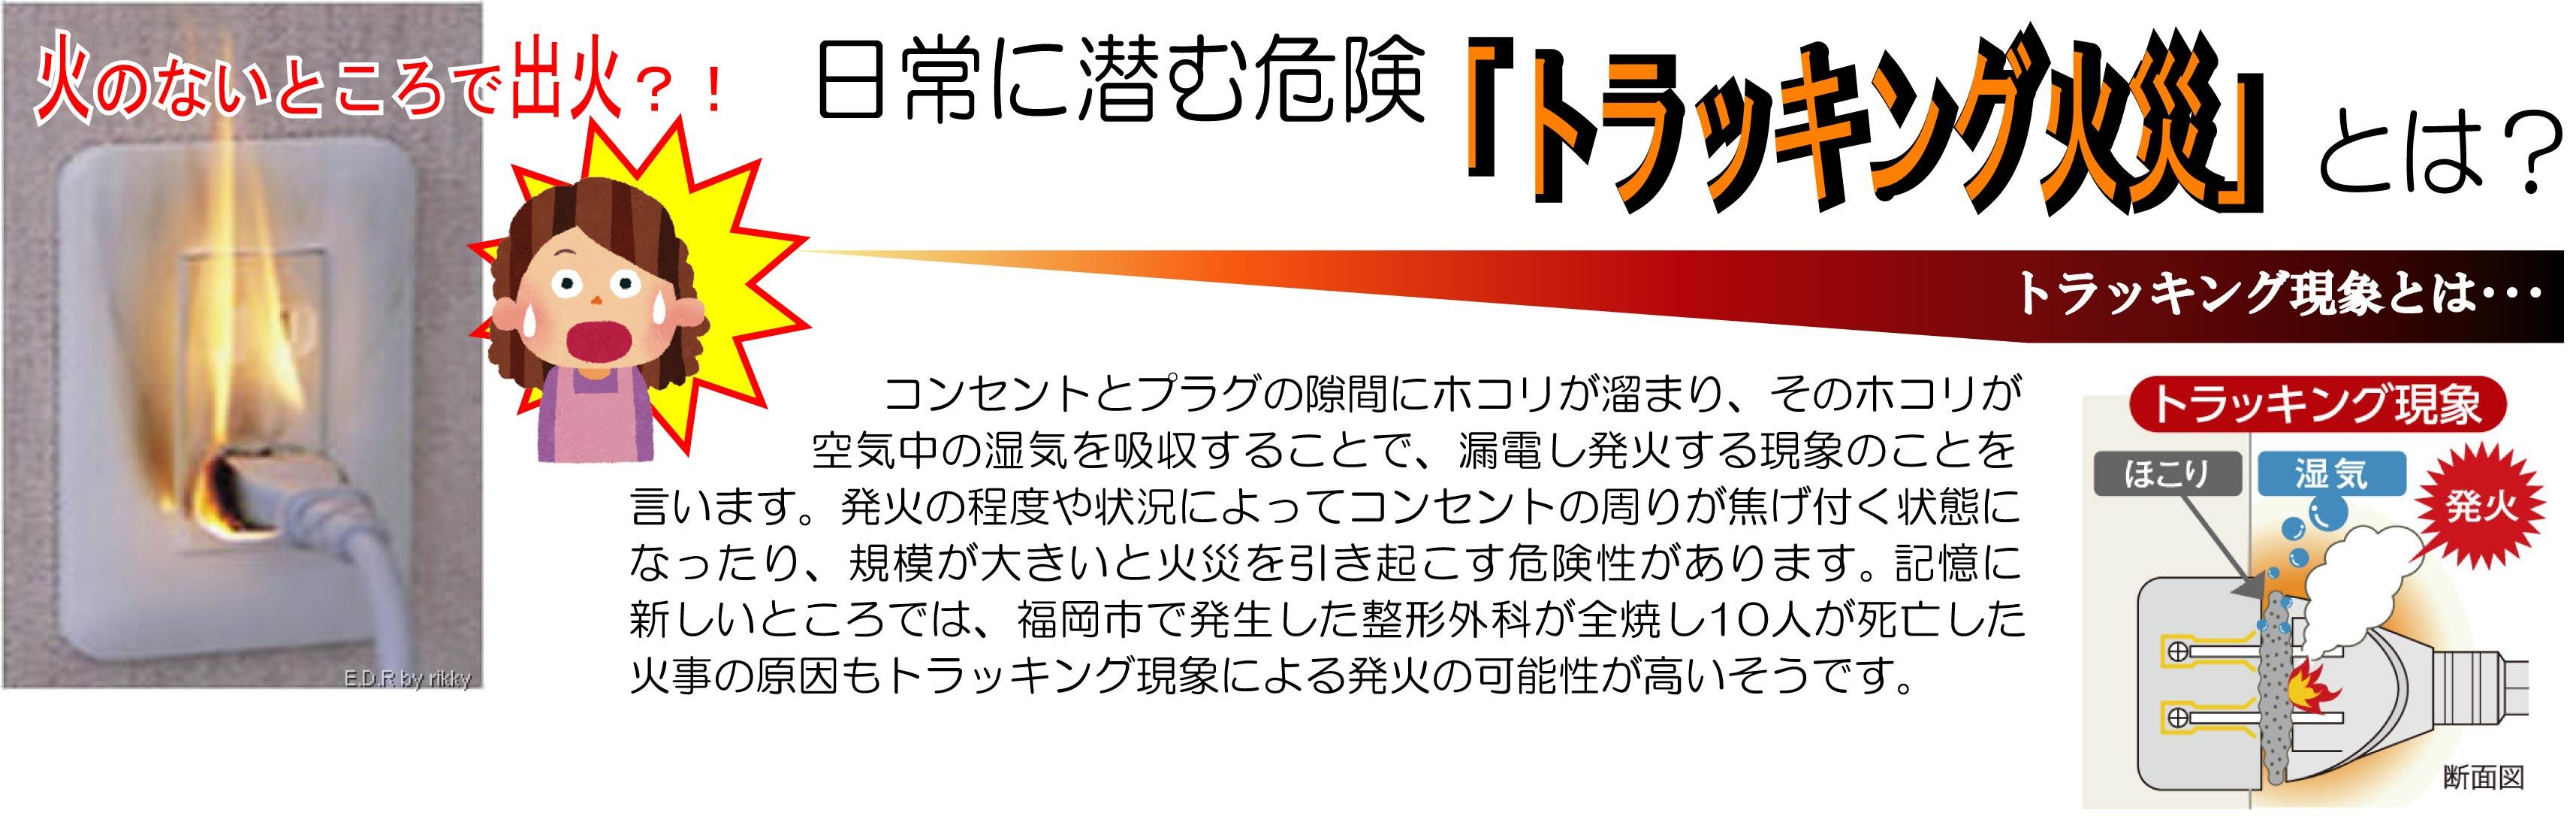 KuraSi-natu-sin79-12.jpg